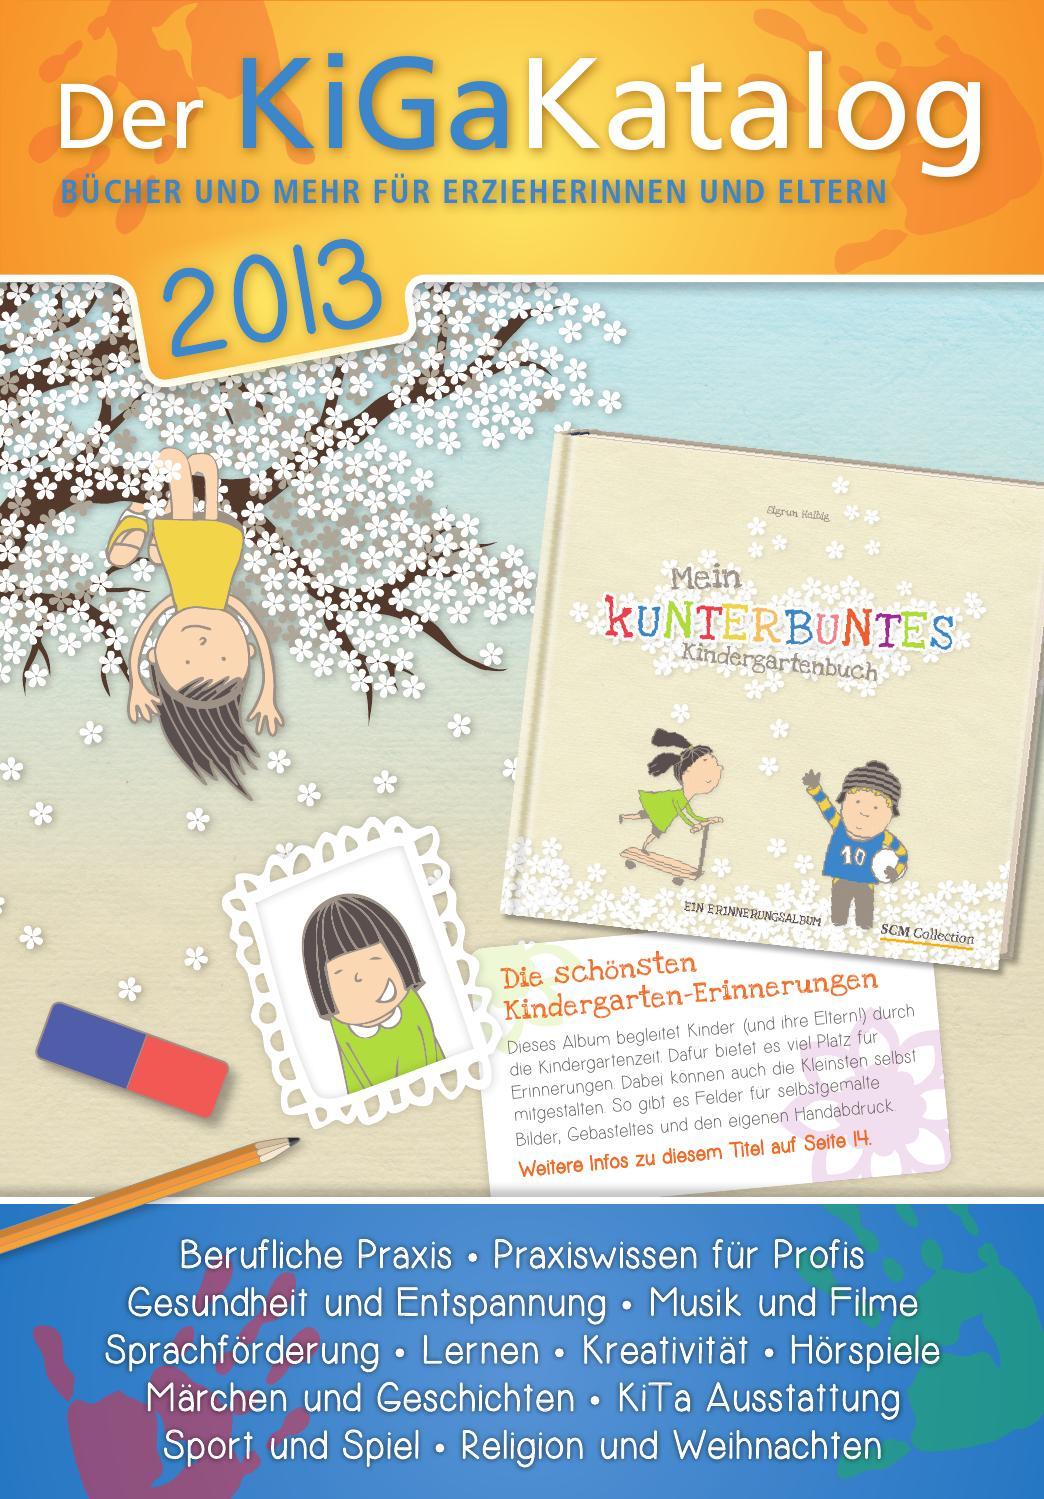 Der KiGa Katalog 2013 by mental-leaps - issuu